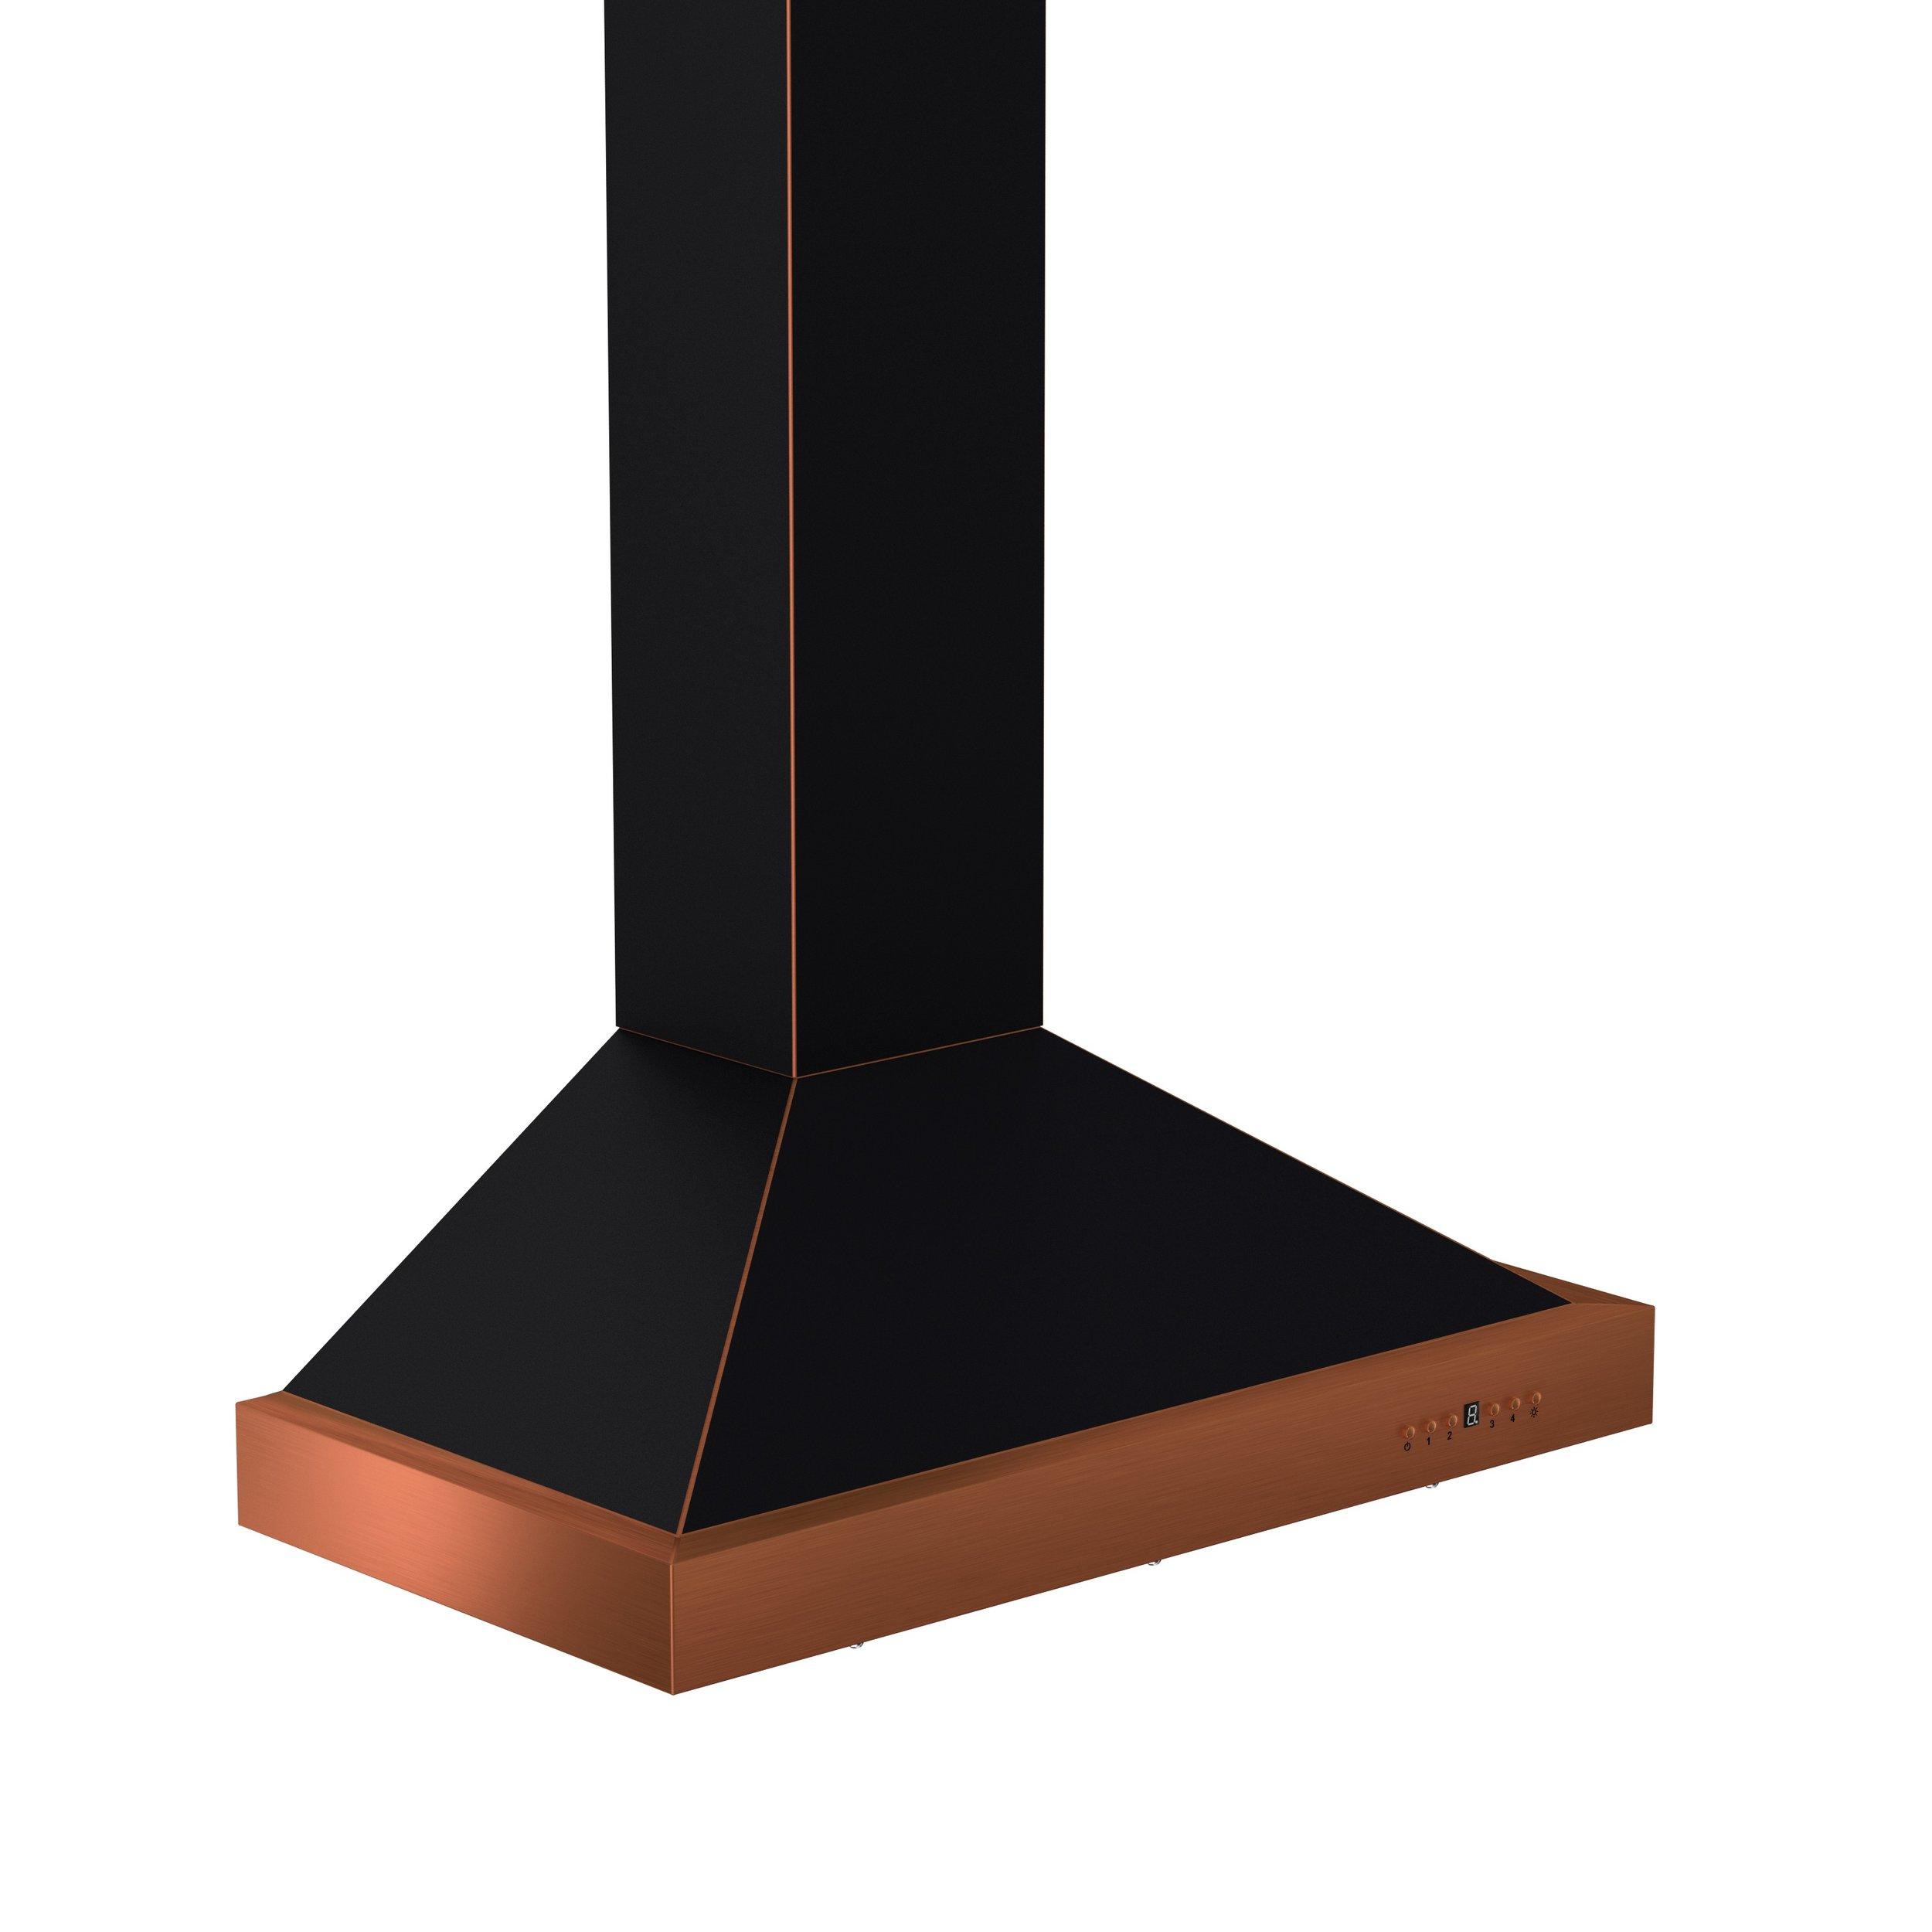 zline-copper-wall-mounted-range-hood-KB2-BCXXX-top.jpeg